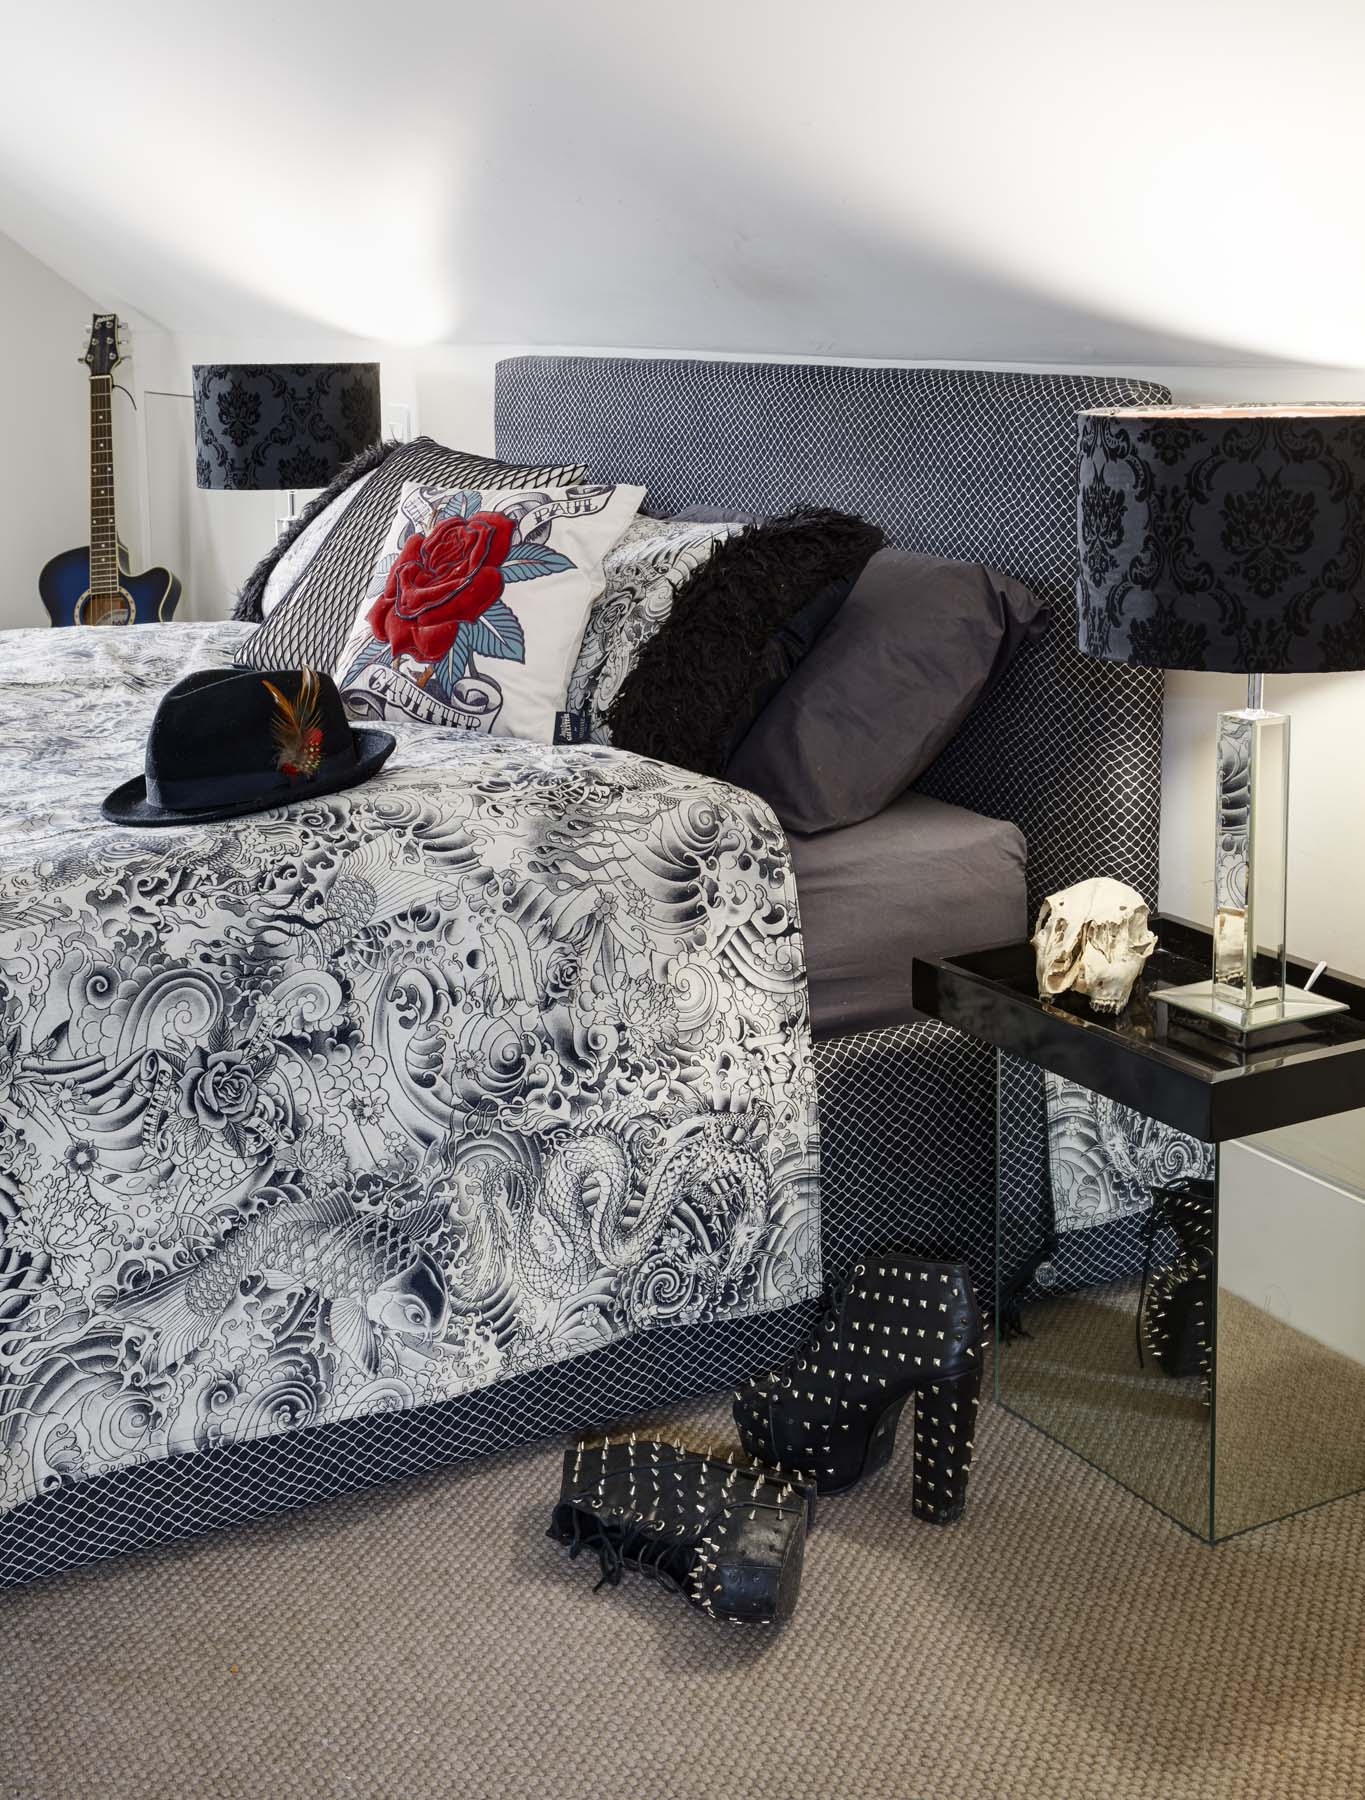 Goth Bed a.jpg